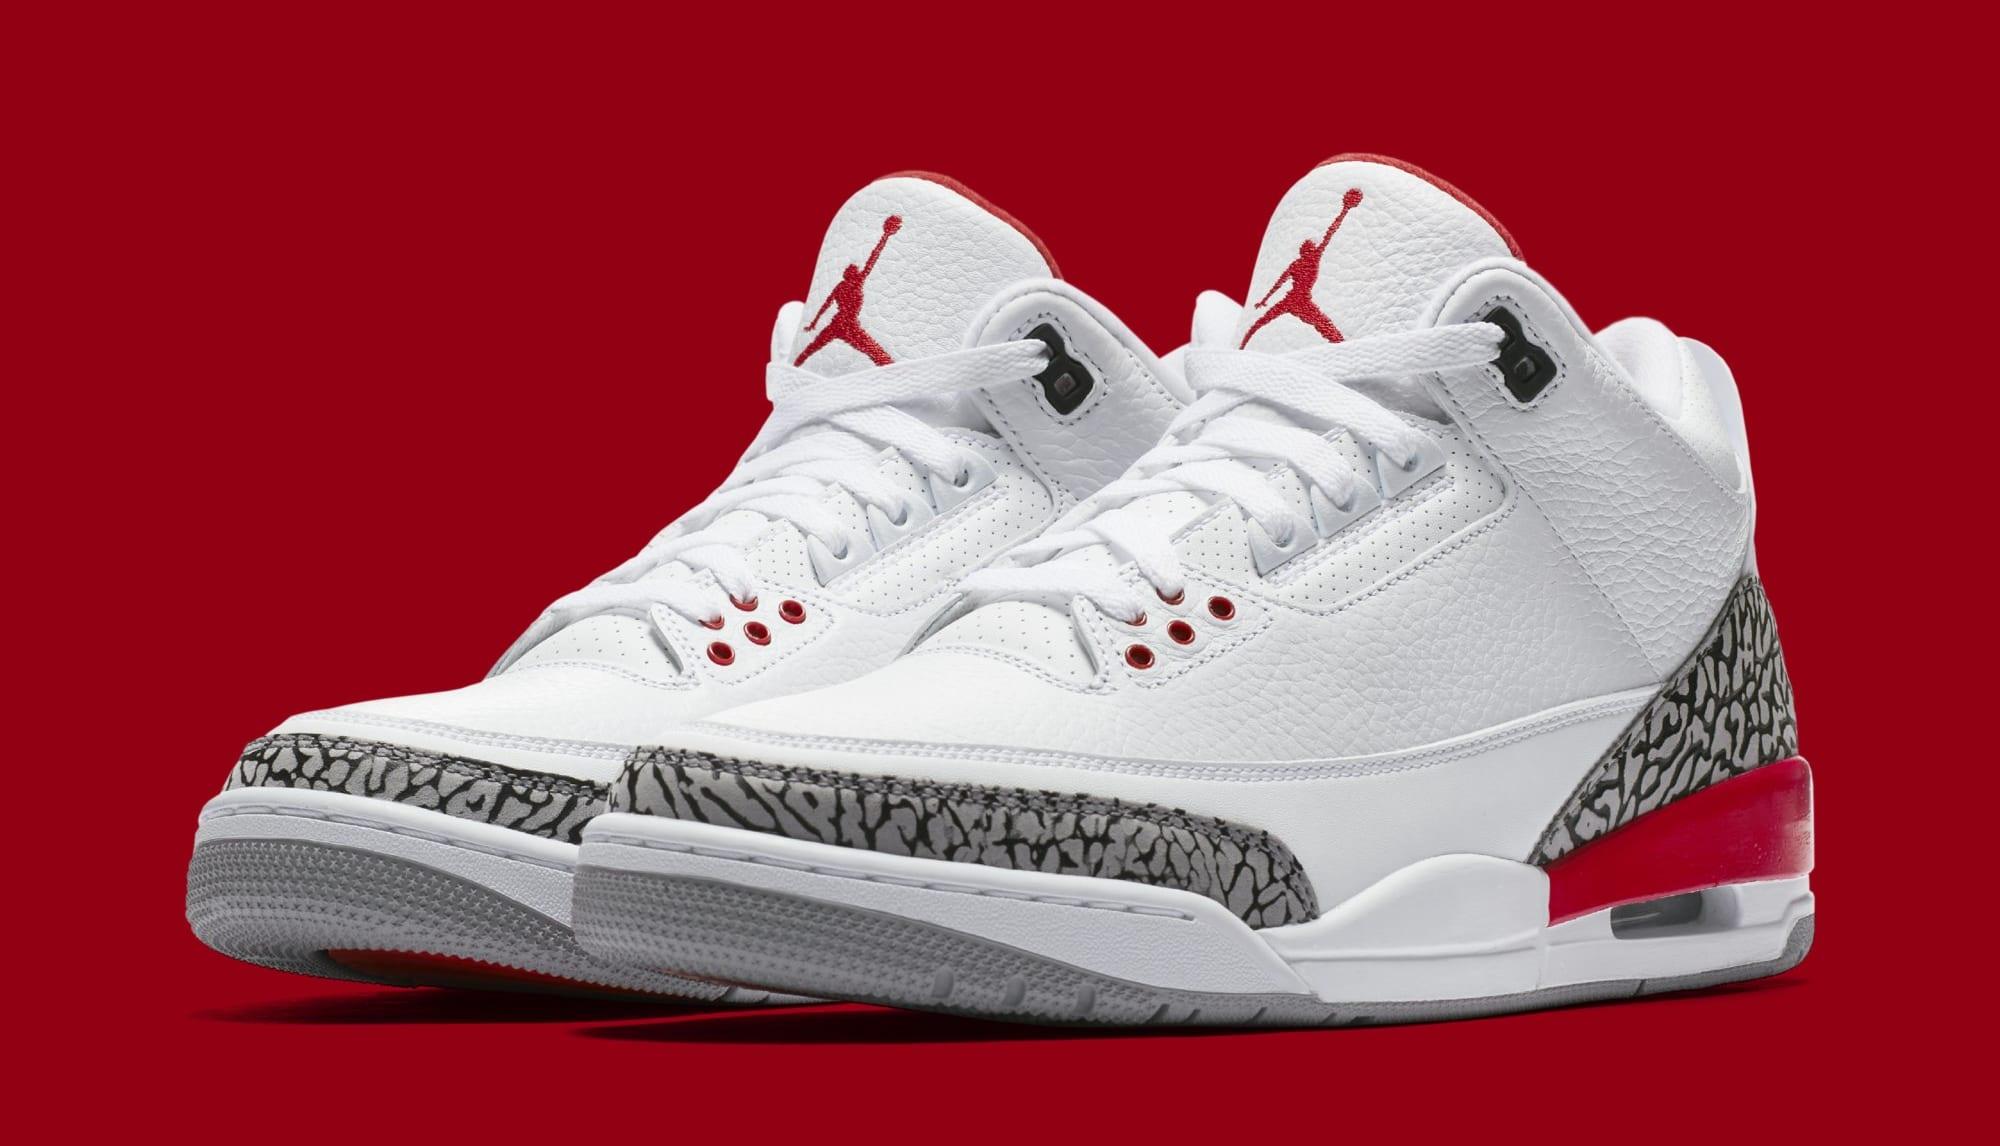 Womens Air Jordan III 3 White/Pink-GreyShoes_a3148